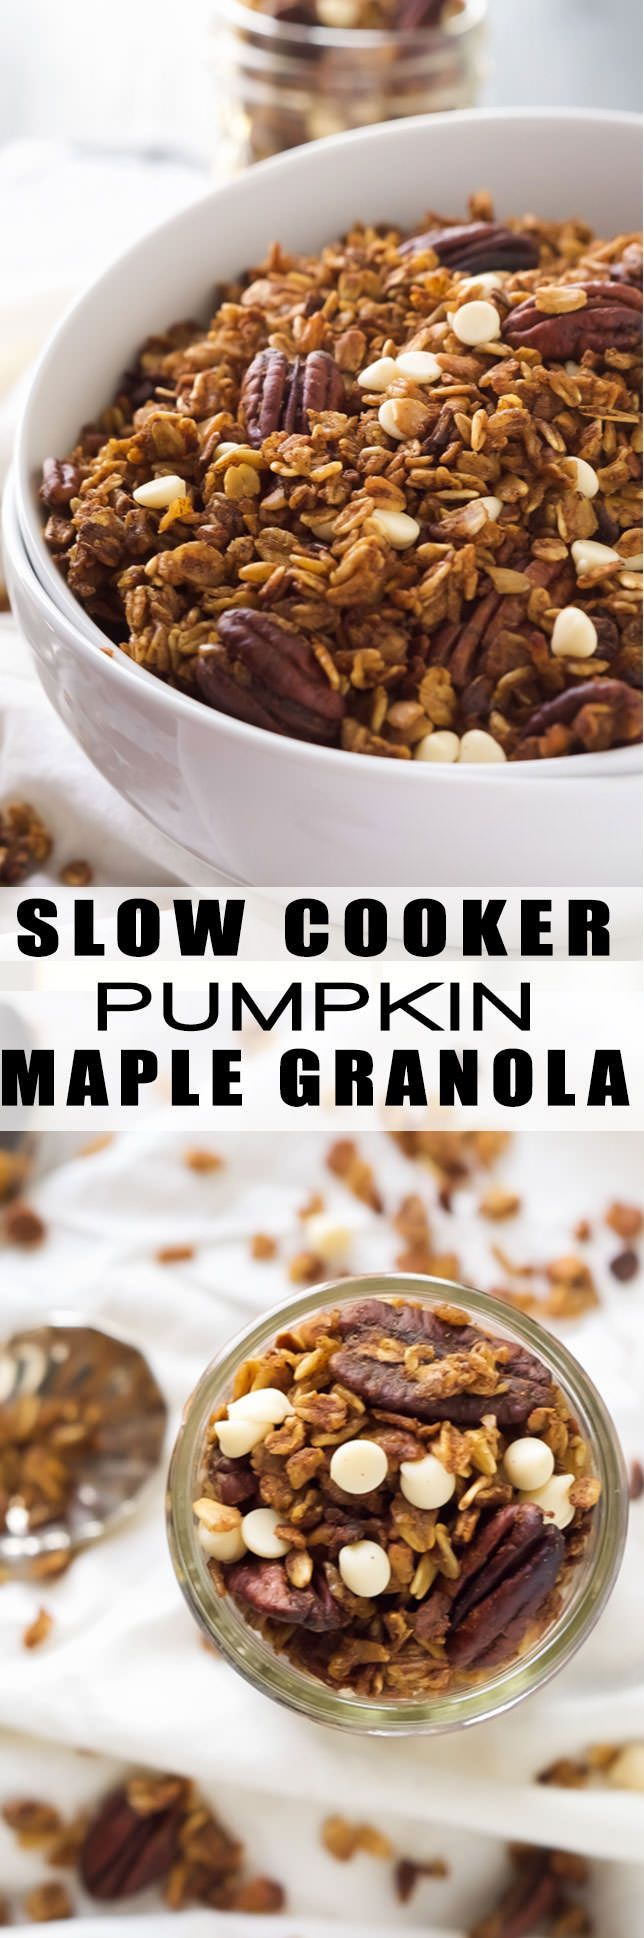 Slow Cooker Pumpkin Granola   Healthy, Crock Pots, Simple. Recipe, Gluten Free, Easy Recipe, Overnight Oatmeal